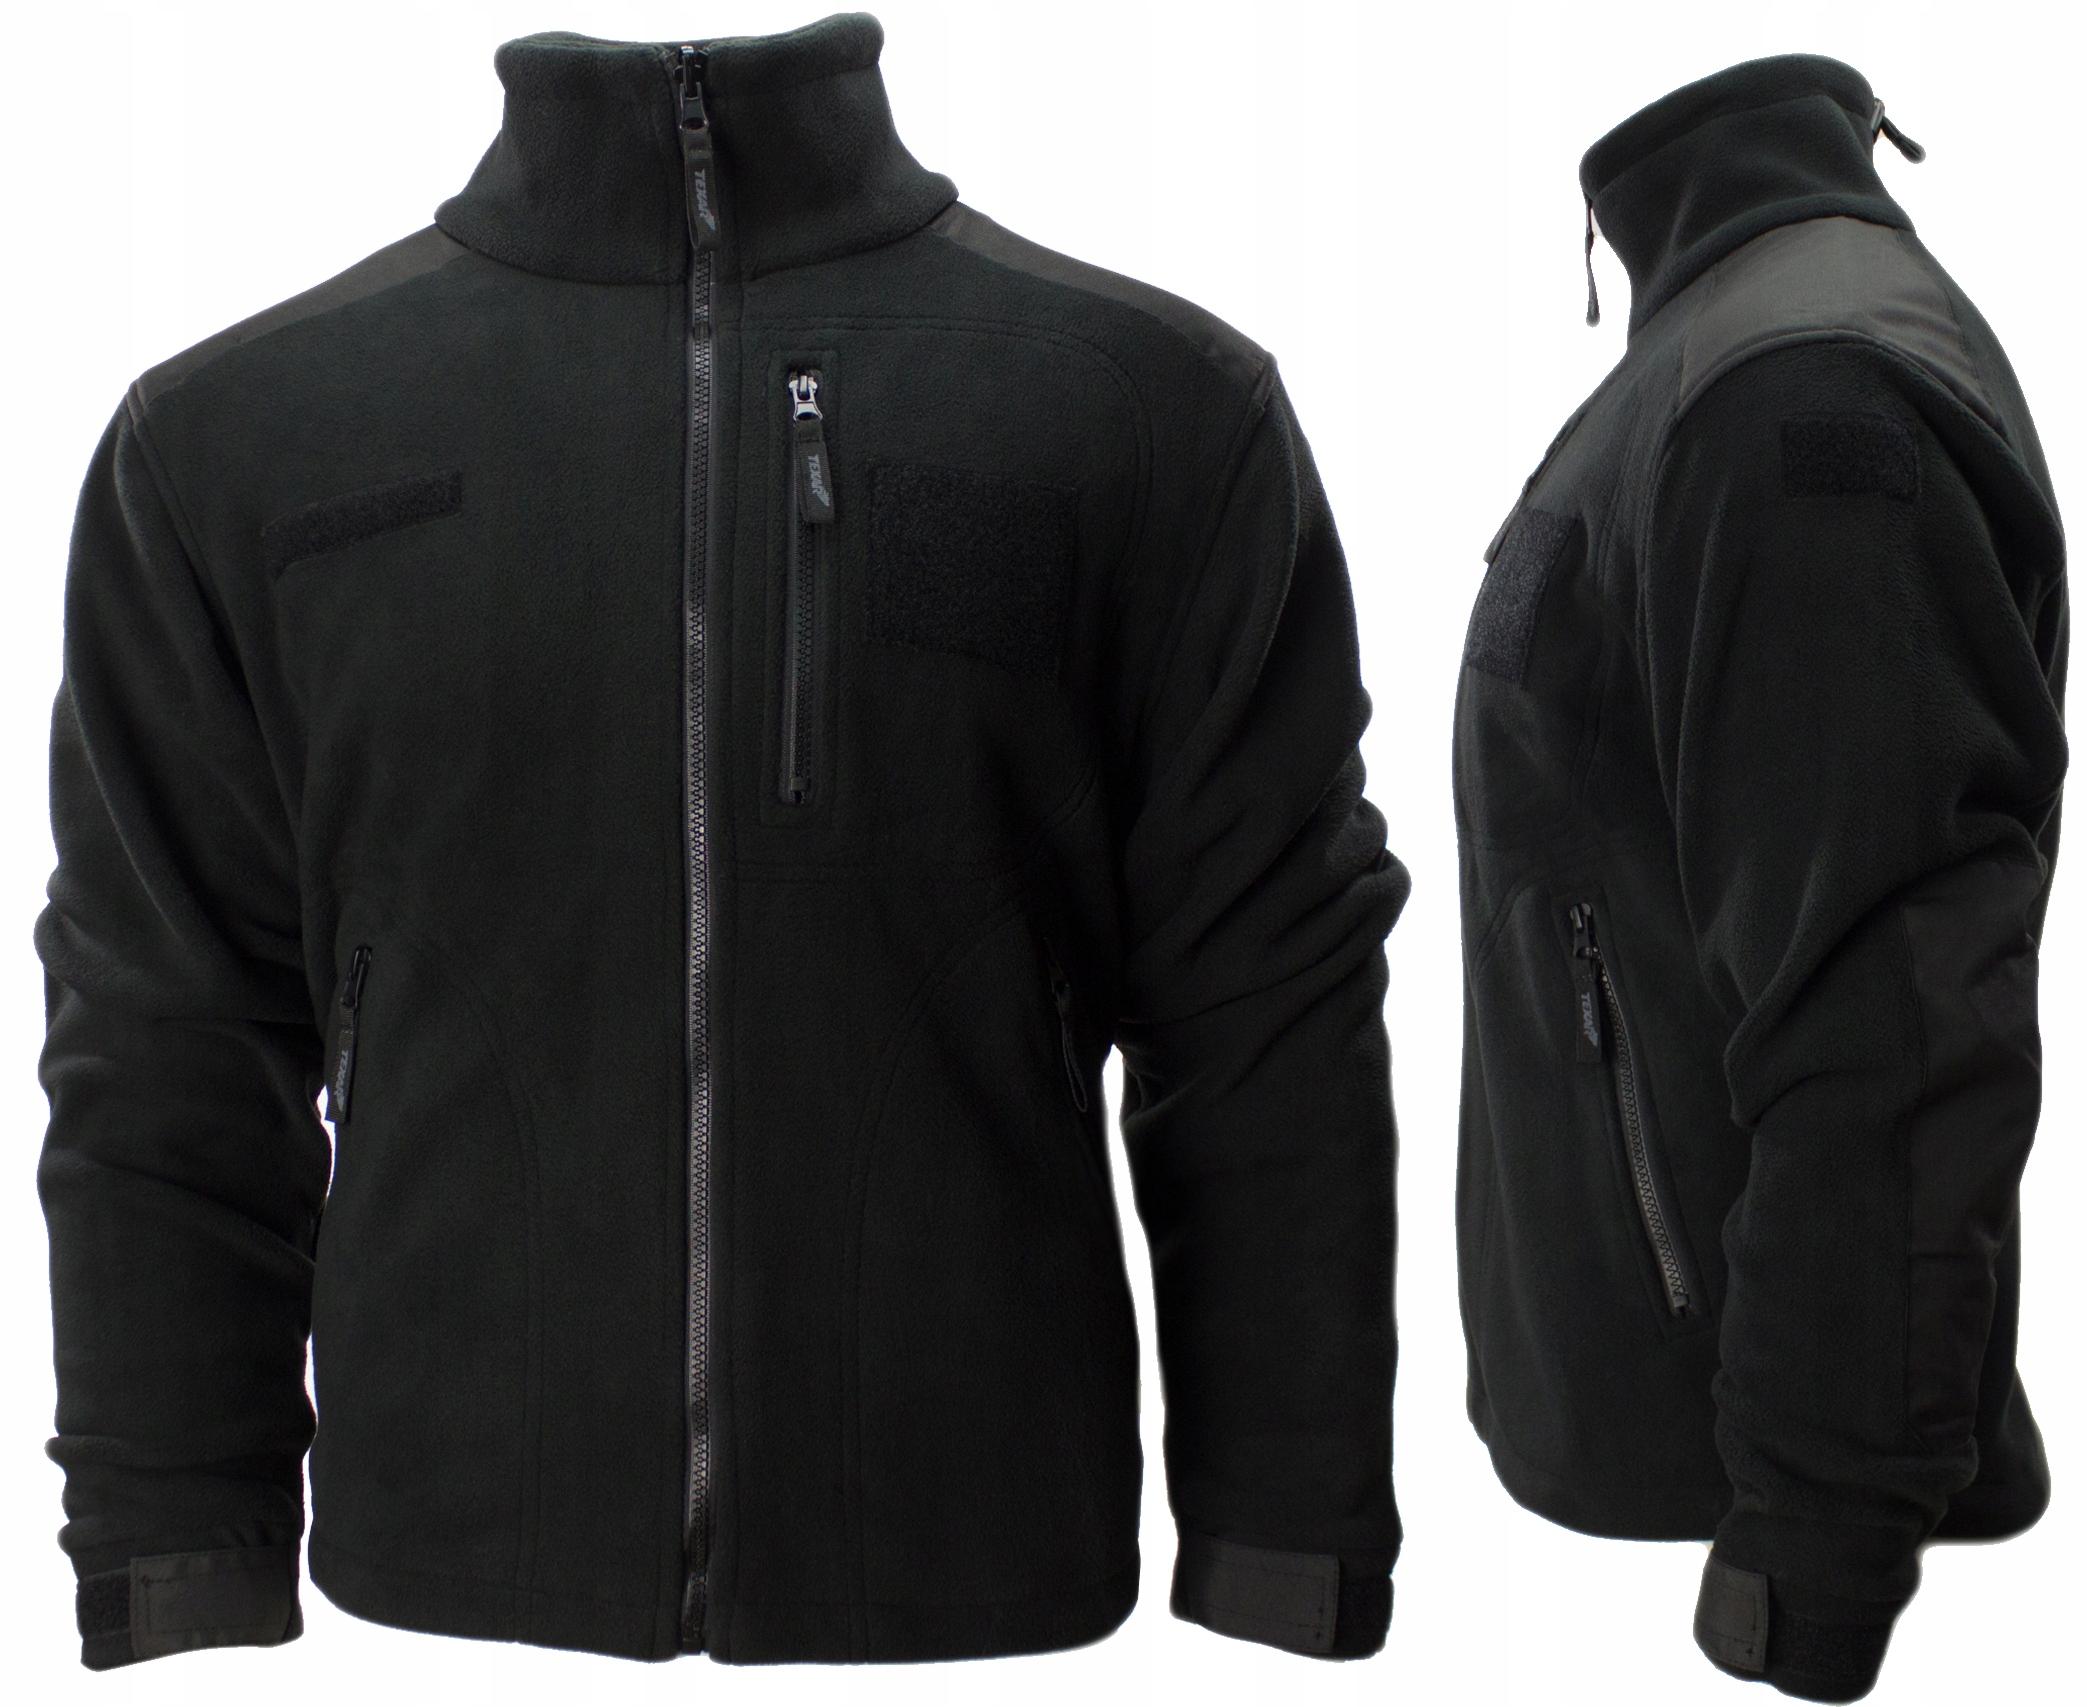 Bunda Polar'Turistická 305 g fleece bunda ECWCS Čierna, 3XL